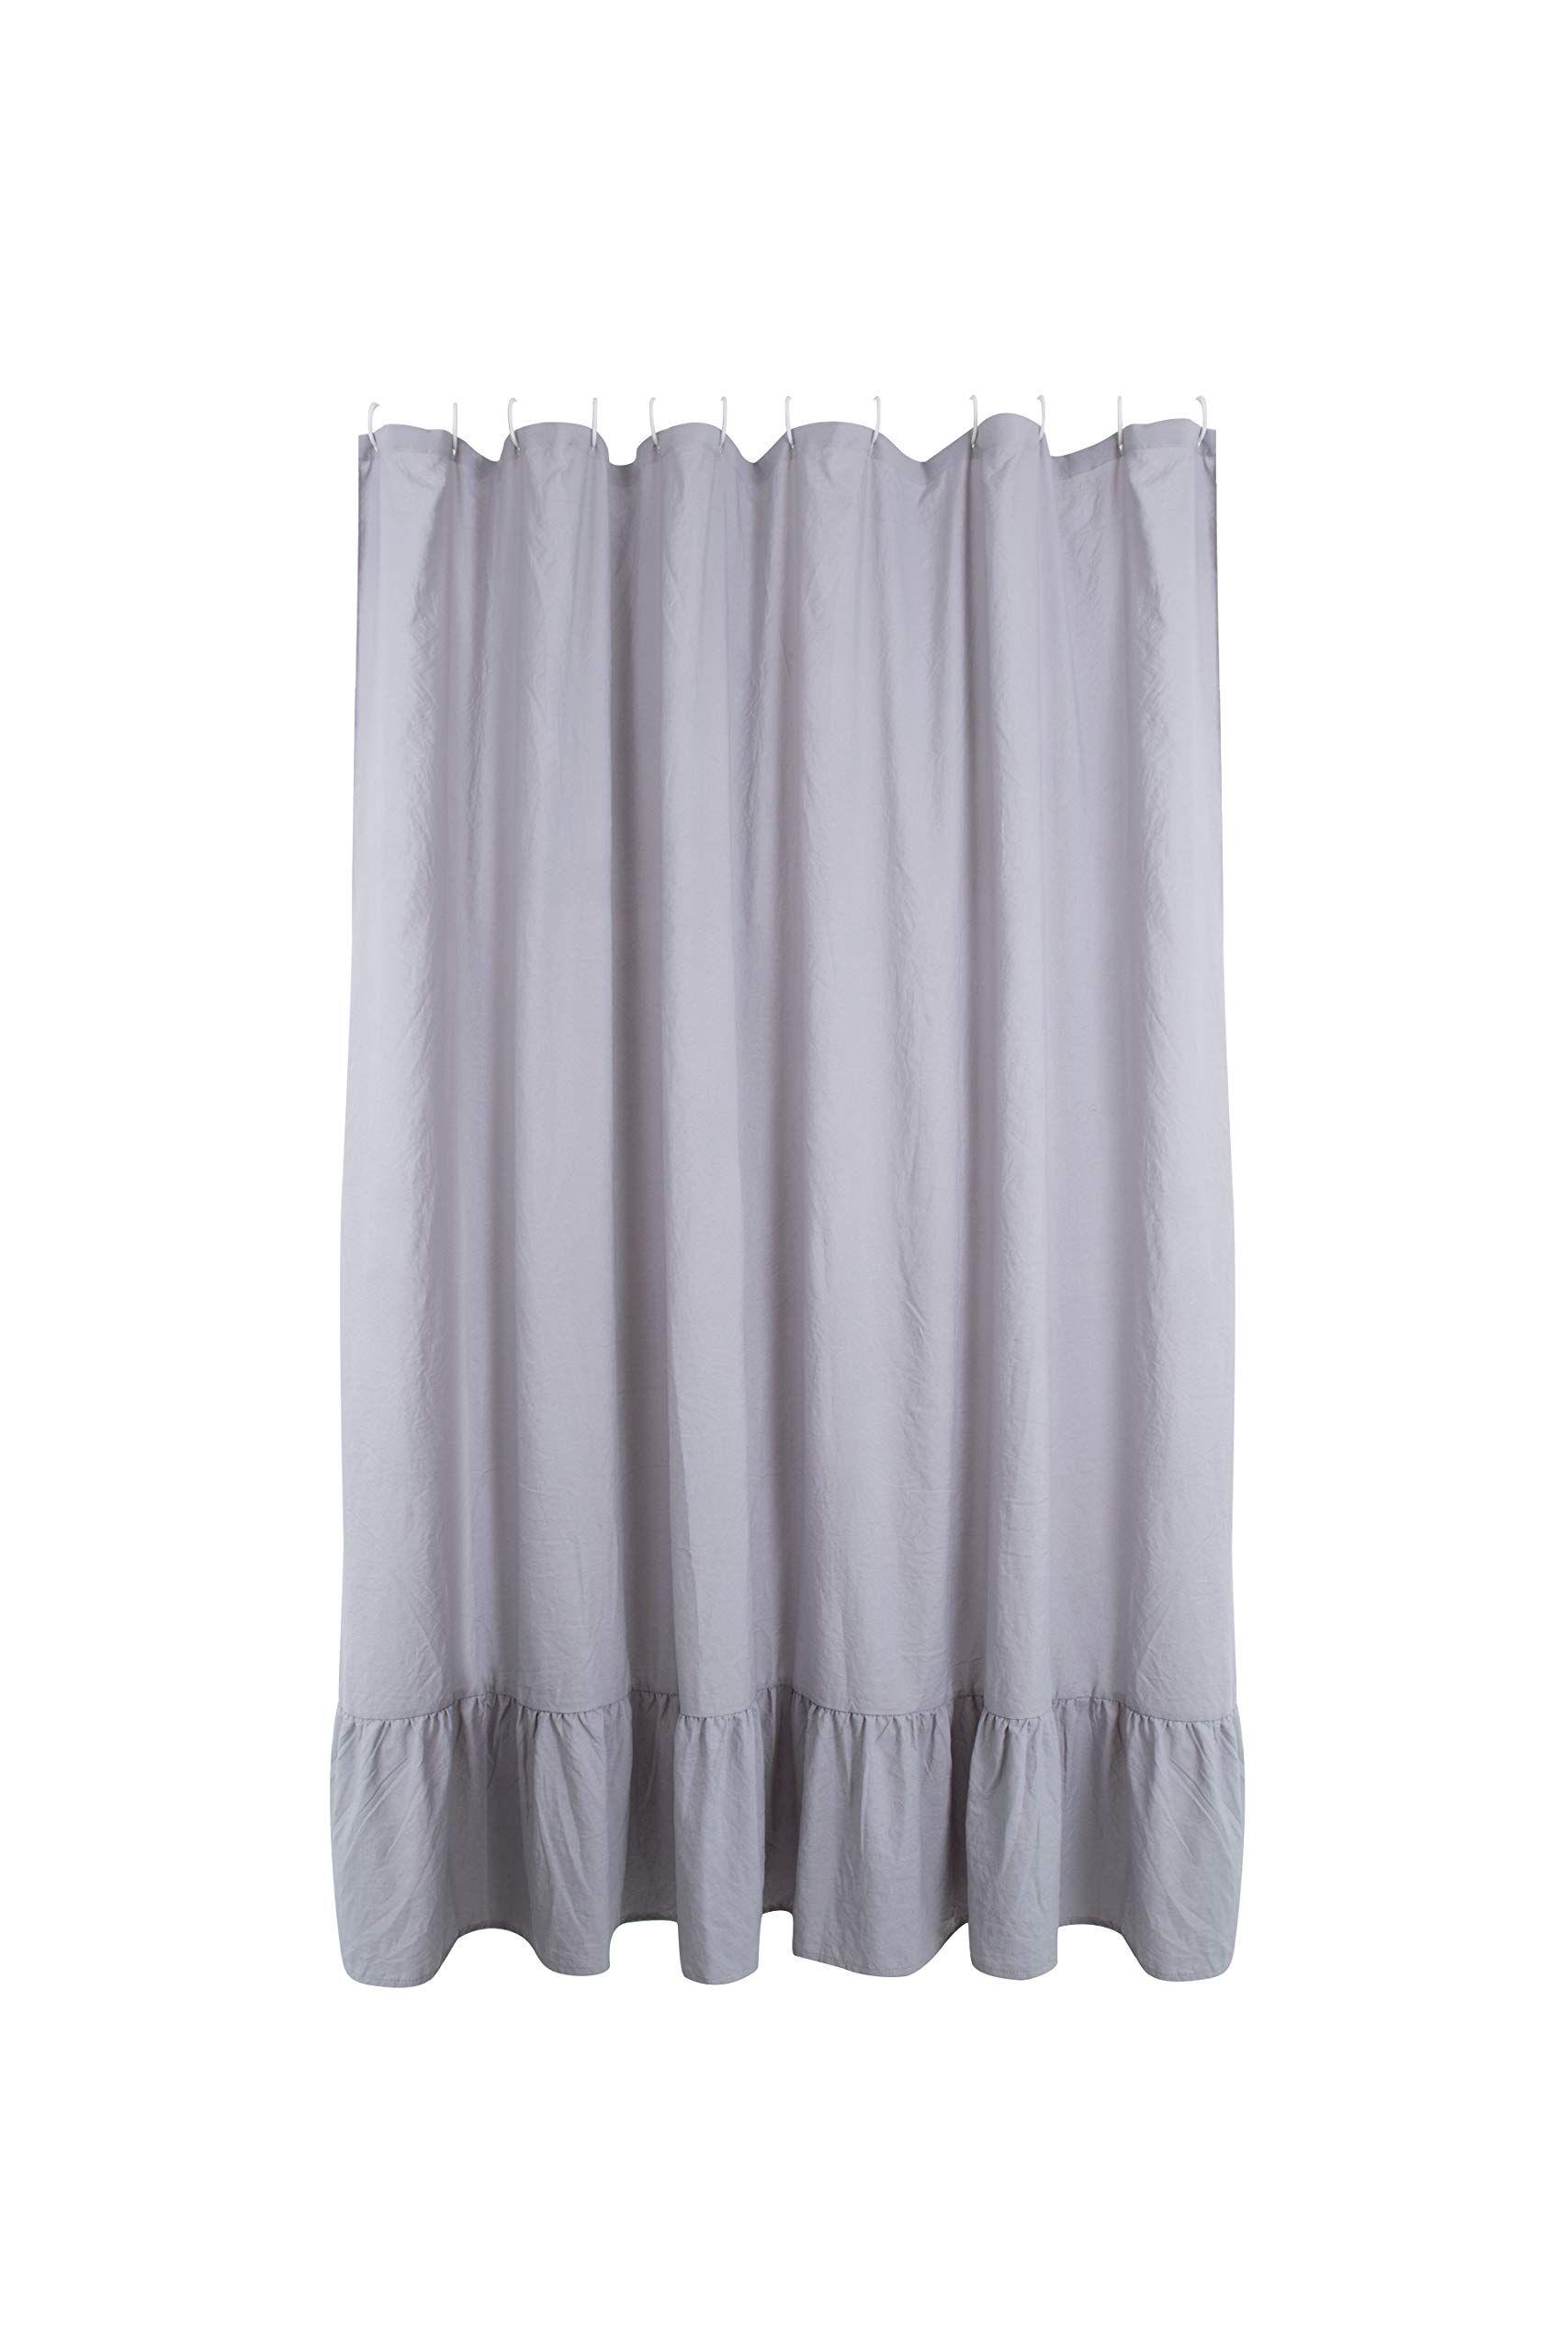 Aniello Gray Ruffle Shower Curtain Stone Washed Microfiber Extra